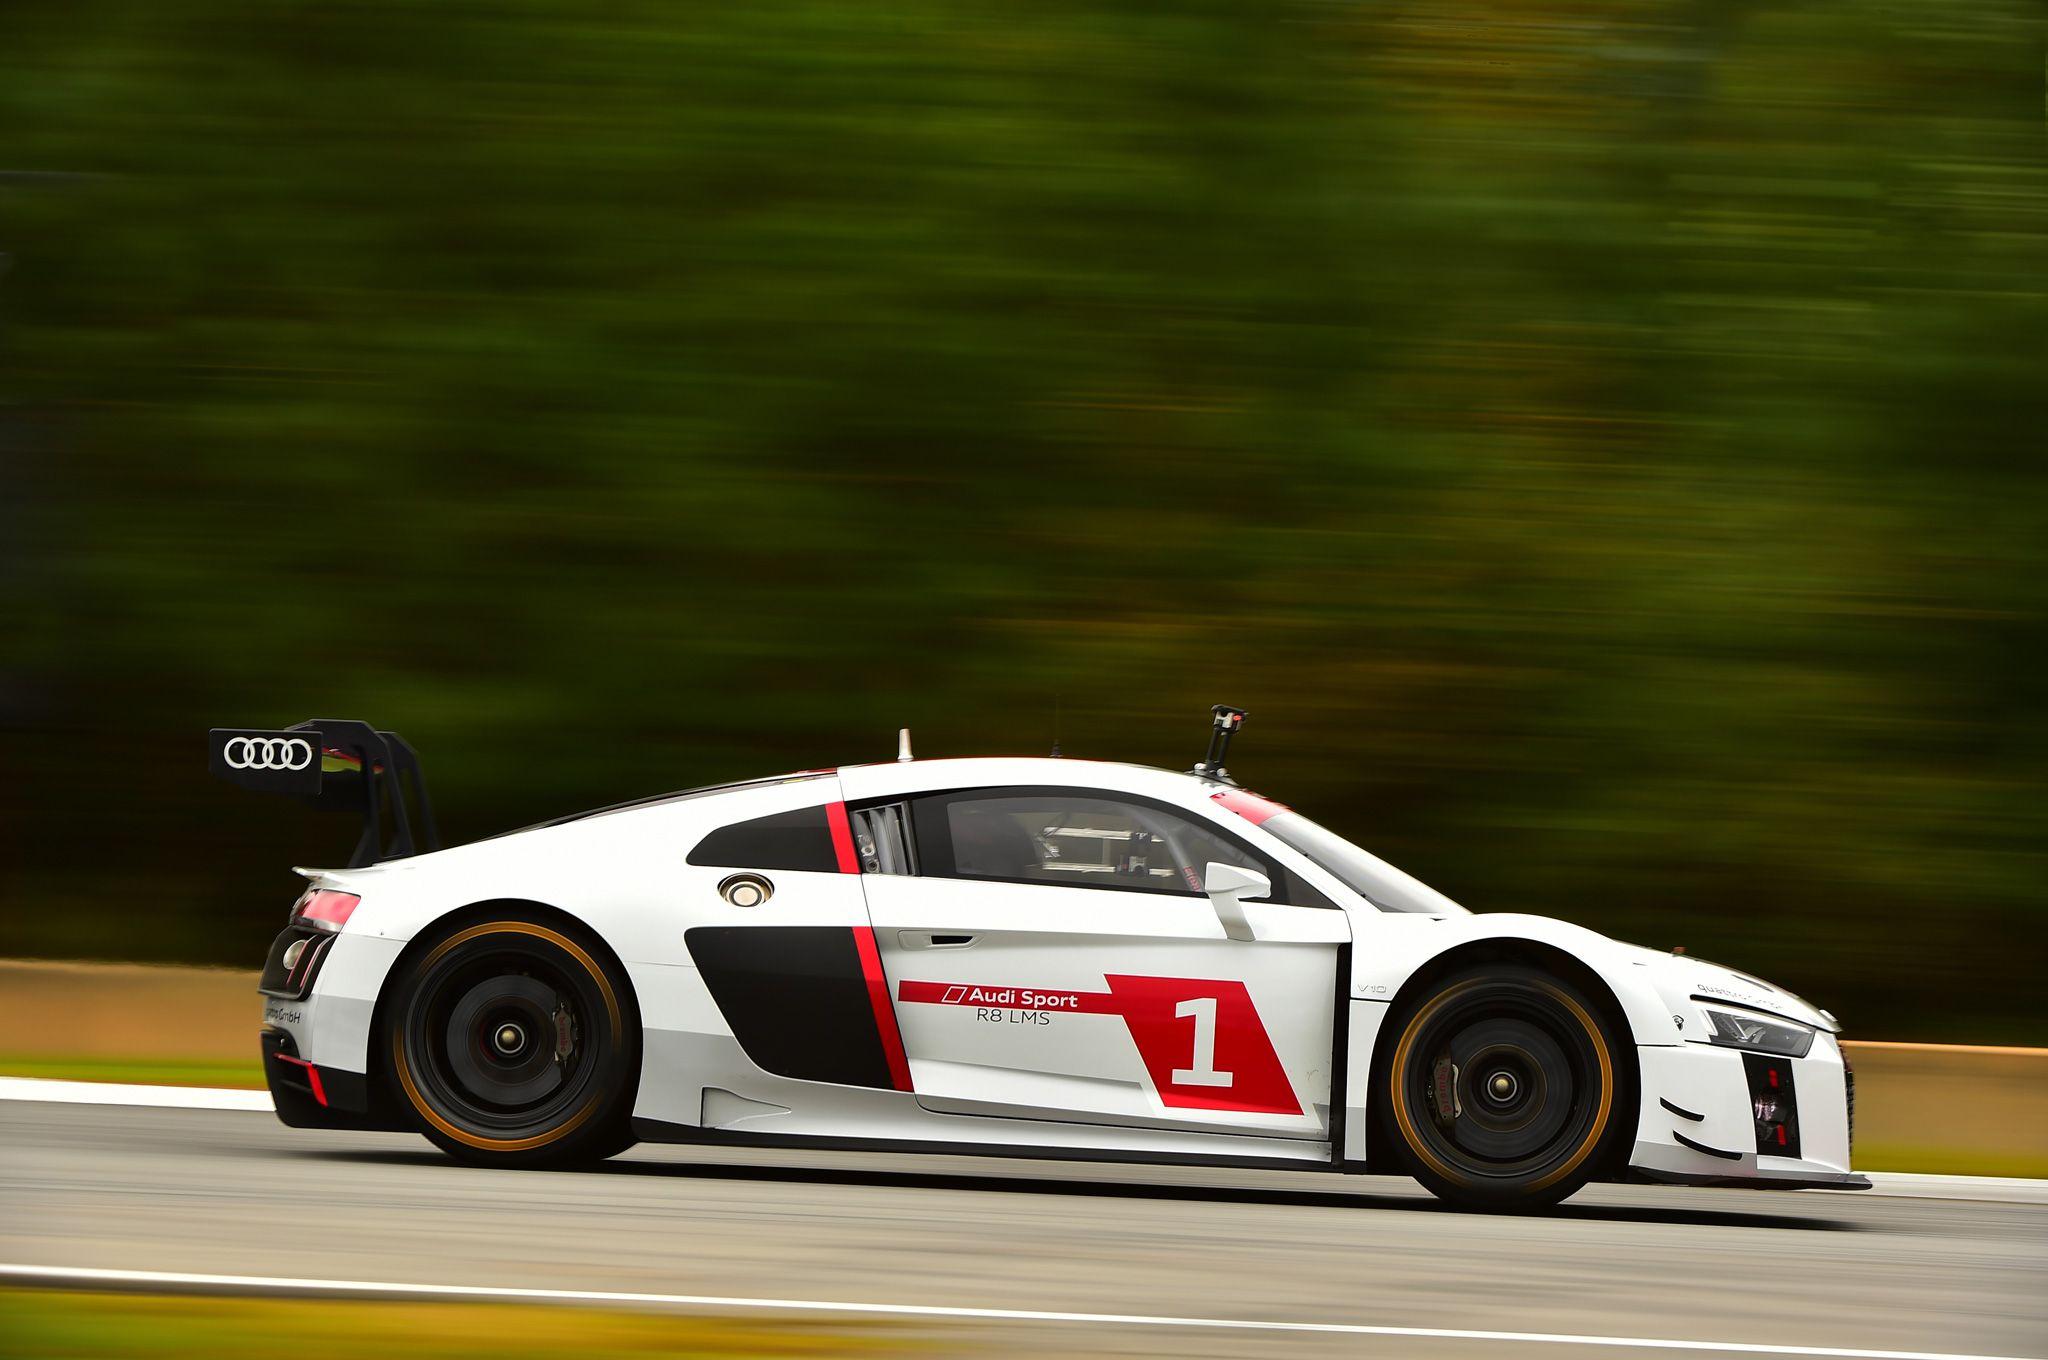 Audi Audi R Bmw Race Car For Sale Audi Car Pictures Porsche - Audi r8 race car for sale